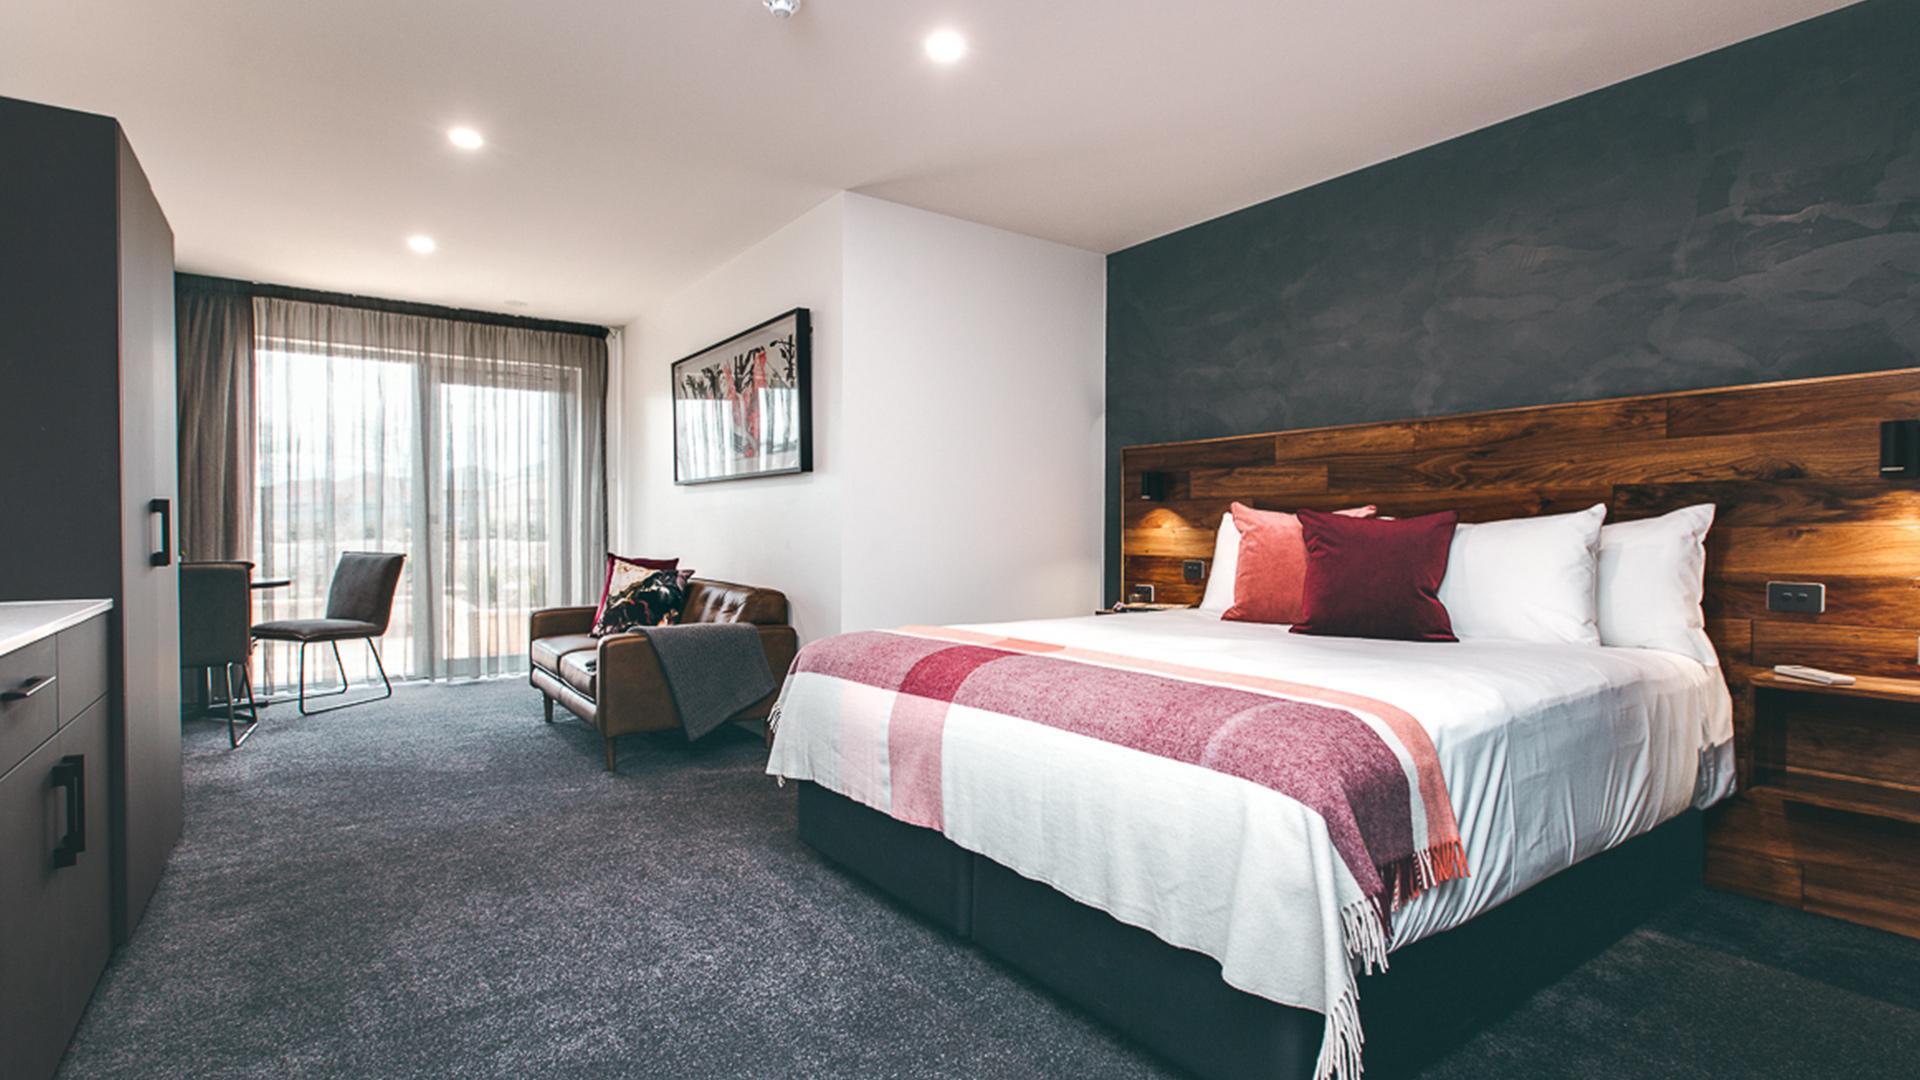 Brownell Room image 1 at Maylands Lodge by Hobart City Council, Tasmania, Australia